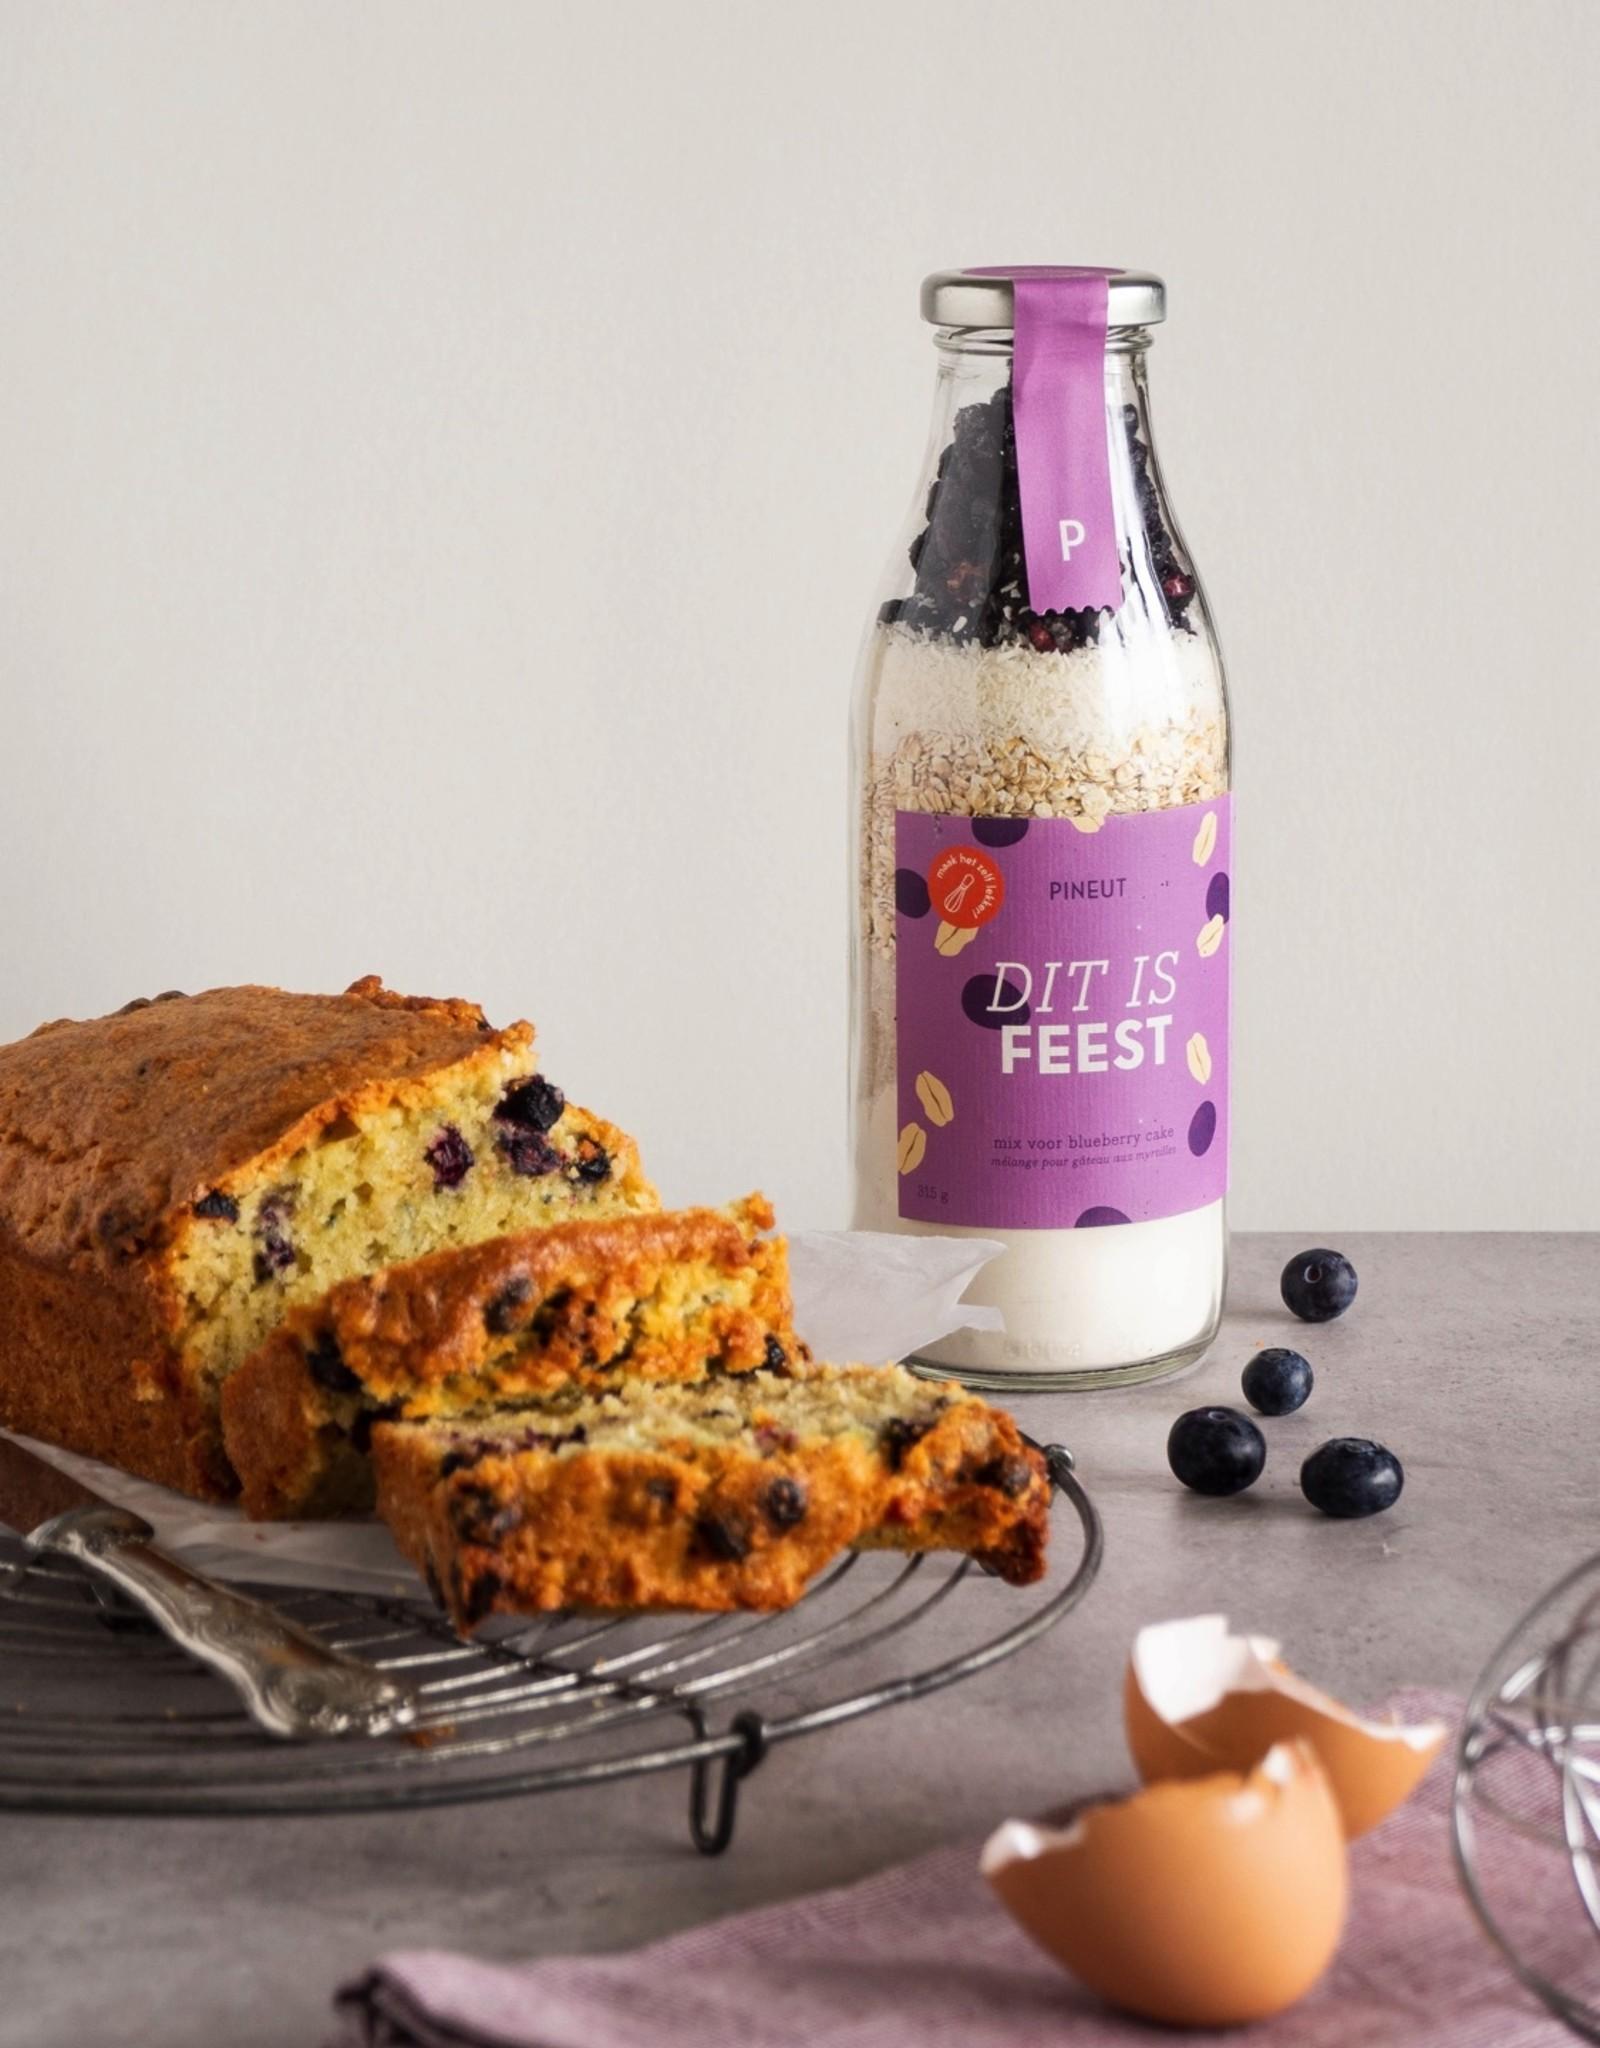 Pineut Pineut DIY Cake Blueberry-dit is feest